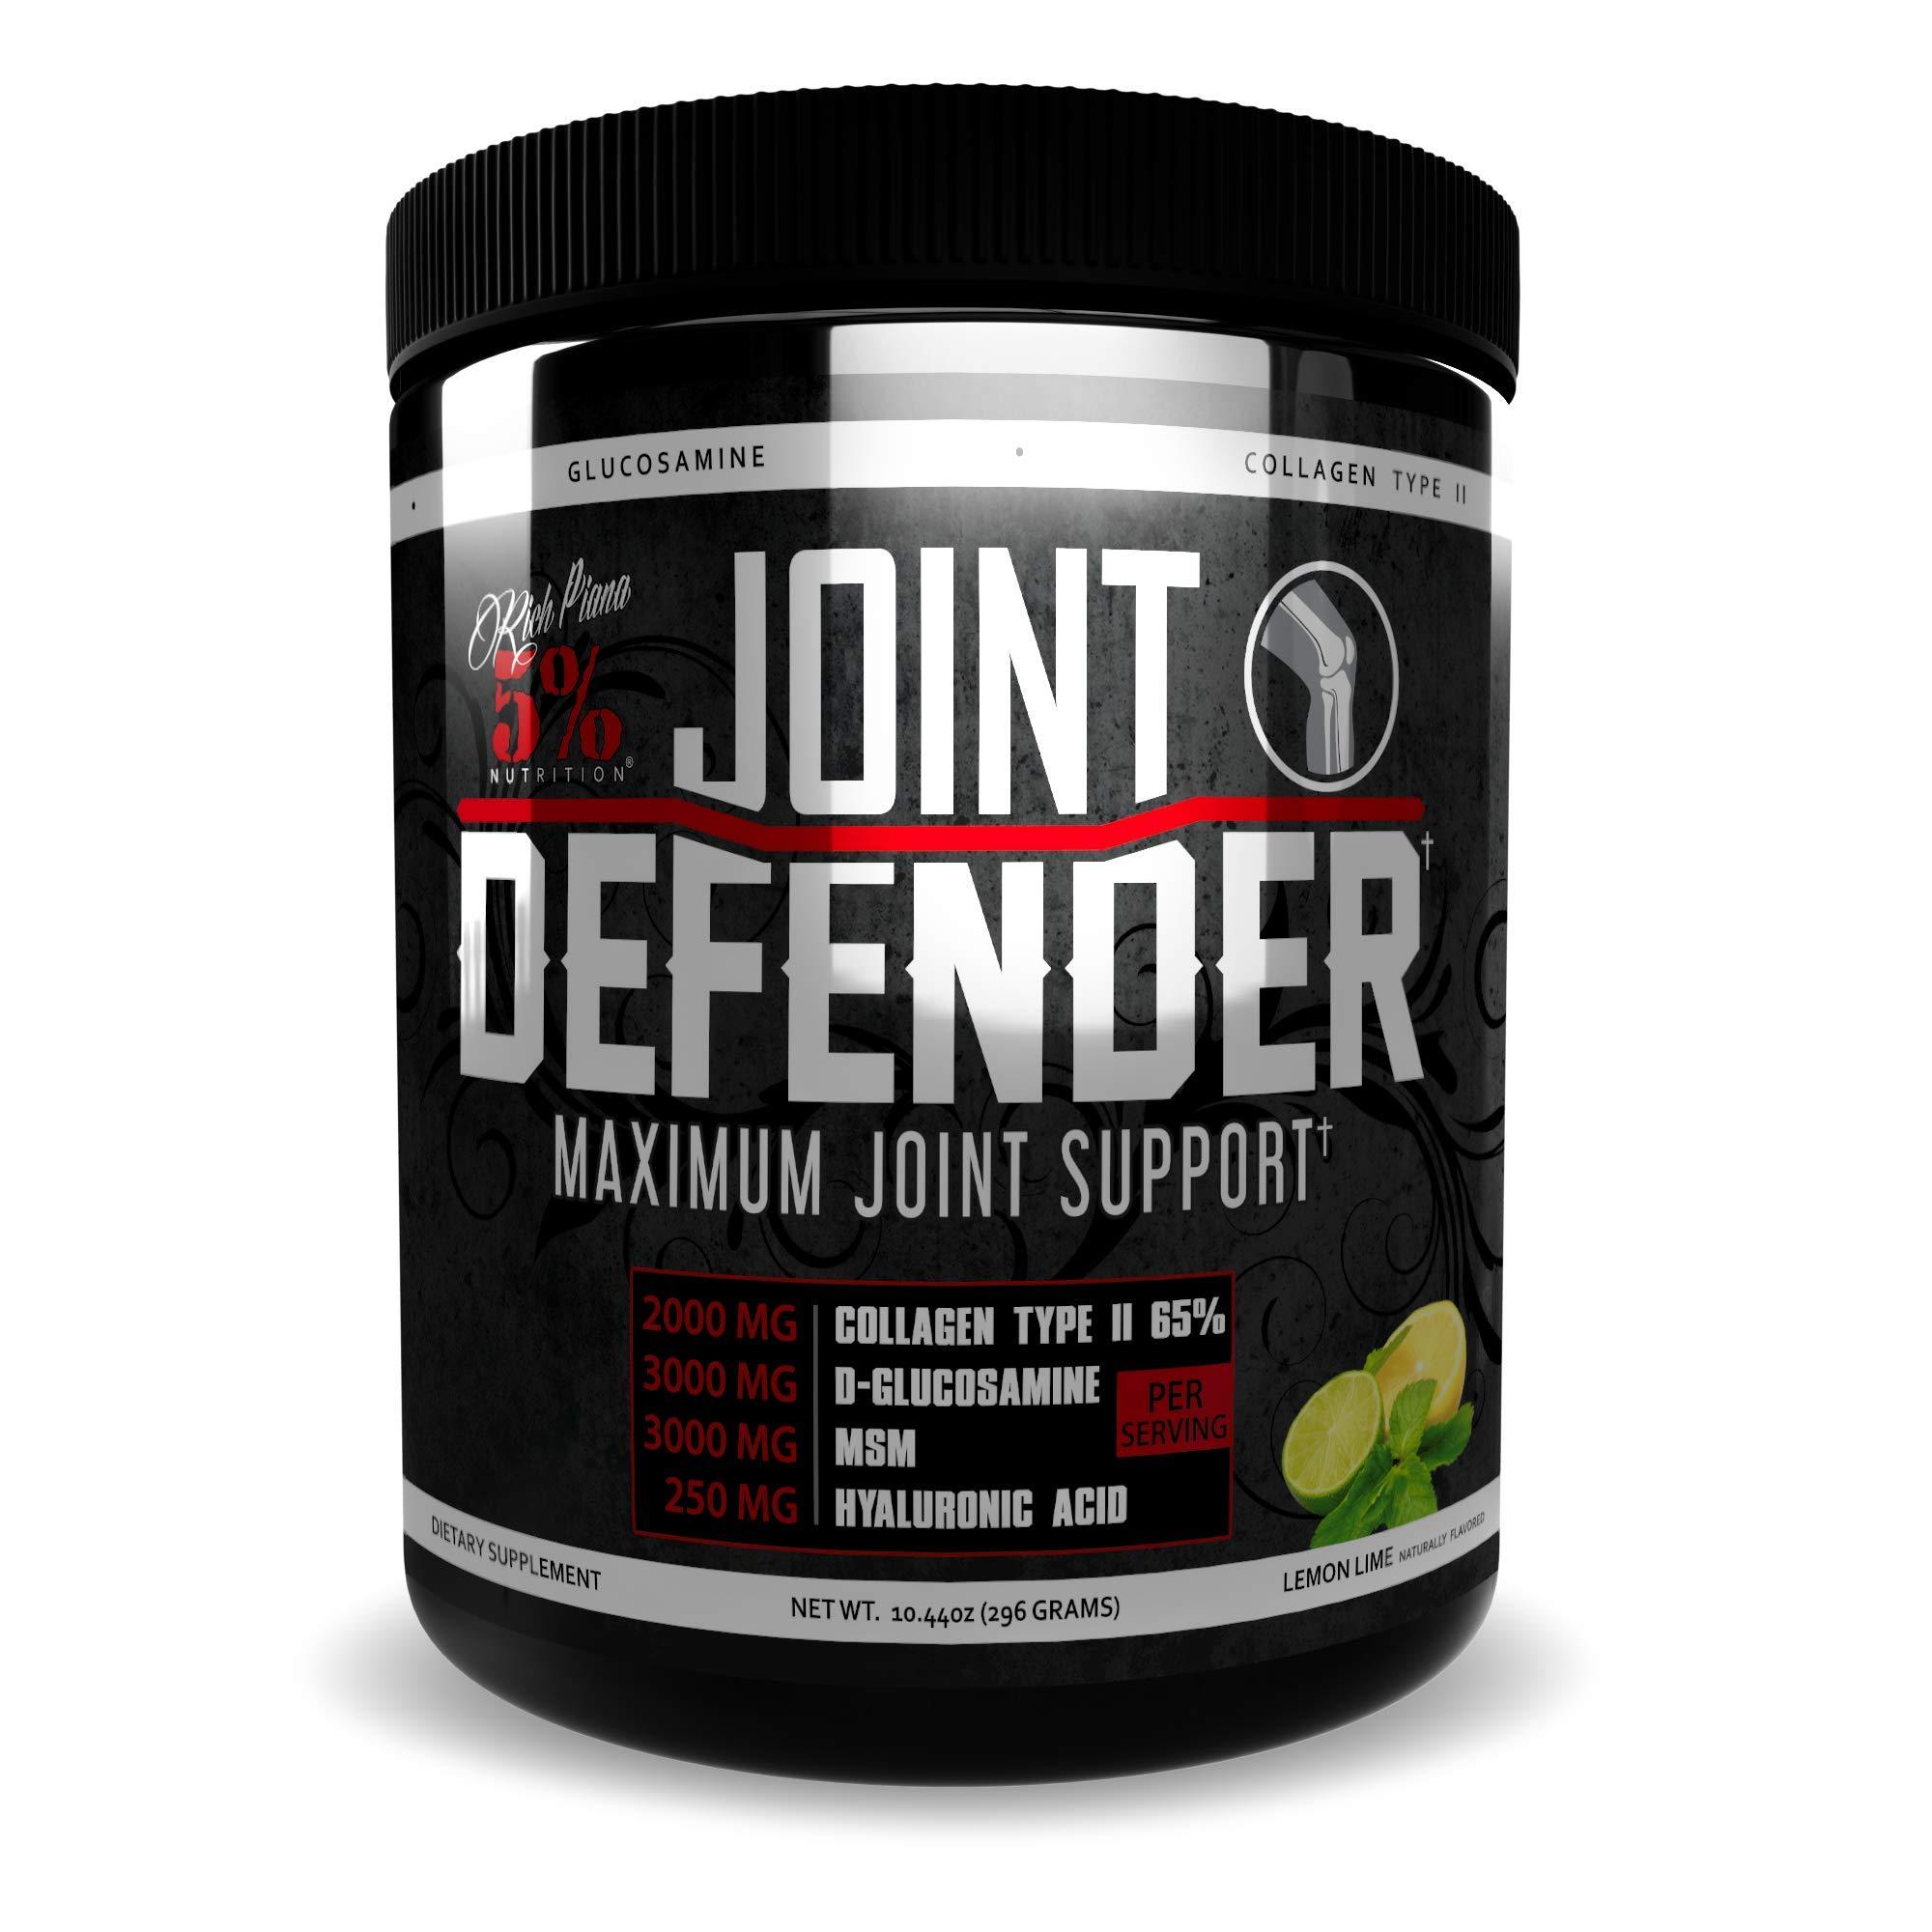 Rich Piana 5% Nutrition Joint Defender Maximum Joint Support (Lemon Lime)